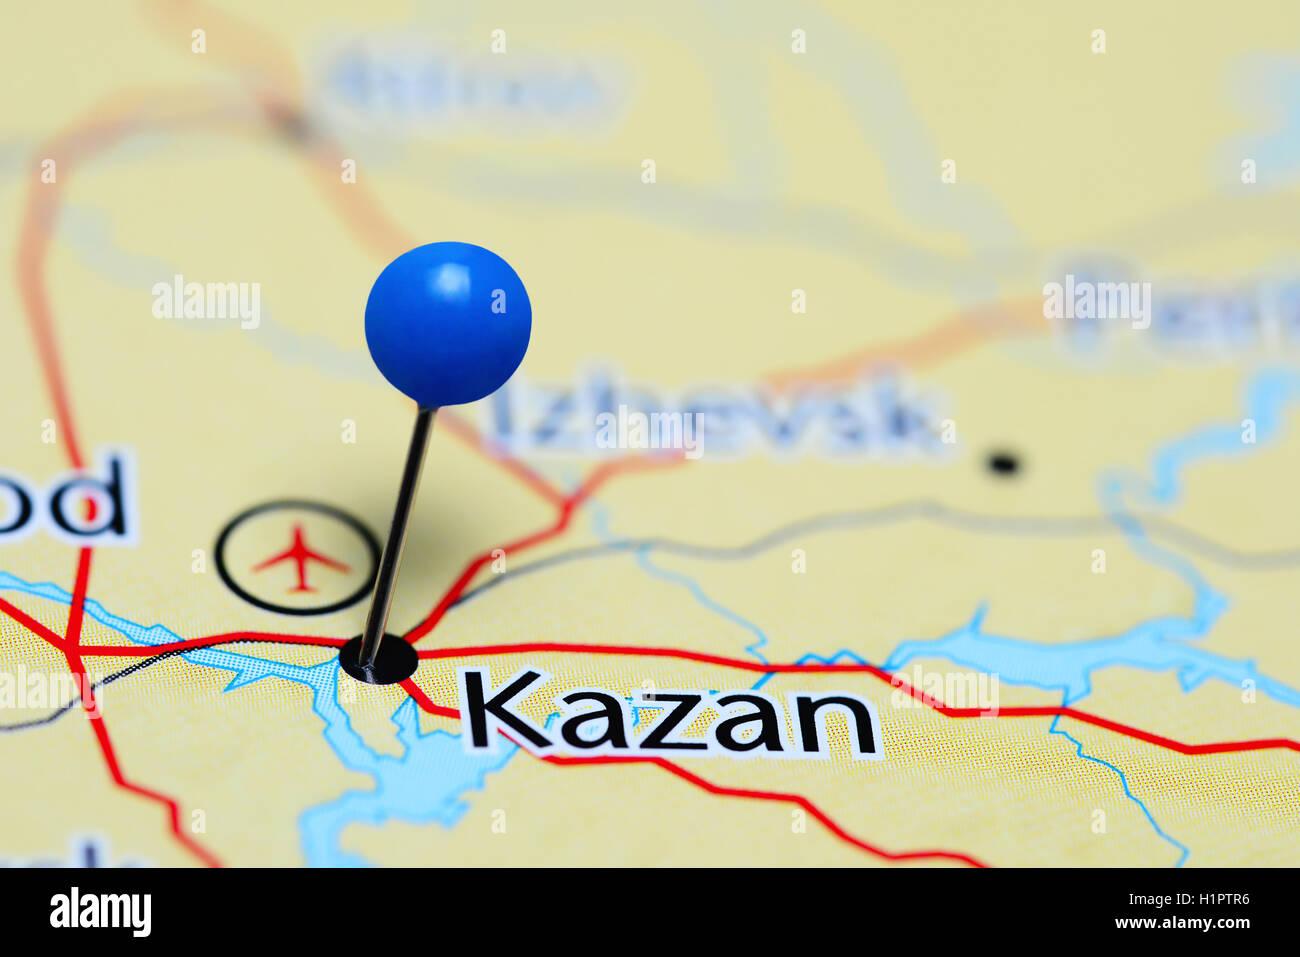 Kazan pinned on a map of Russia Stock Photo: 121589642 - Alamy on